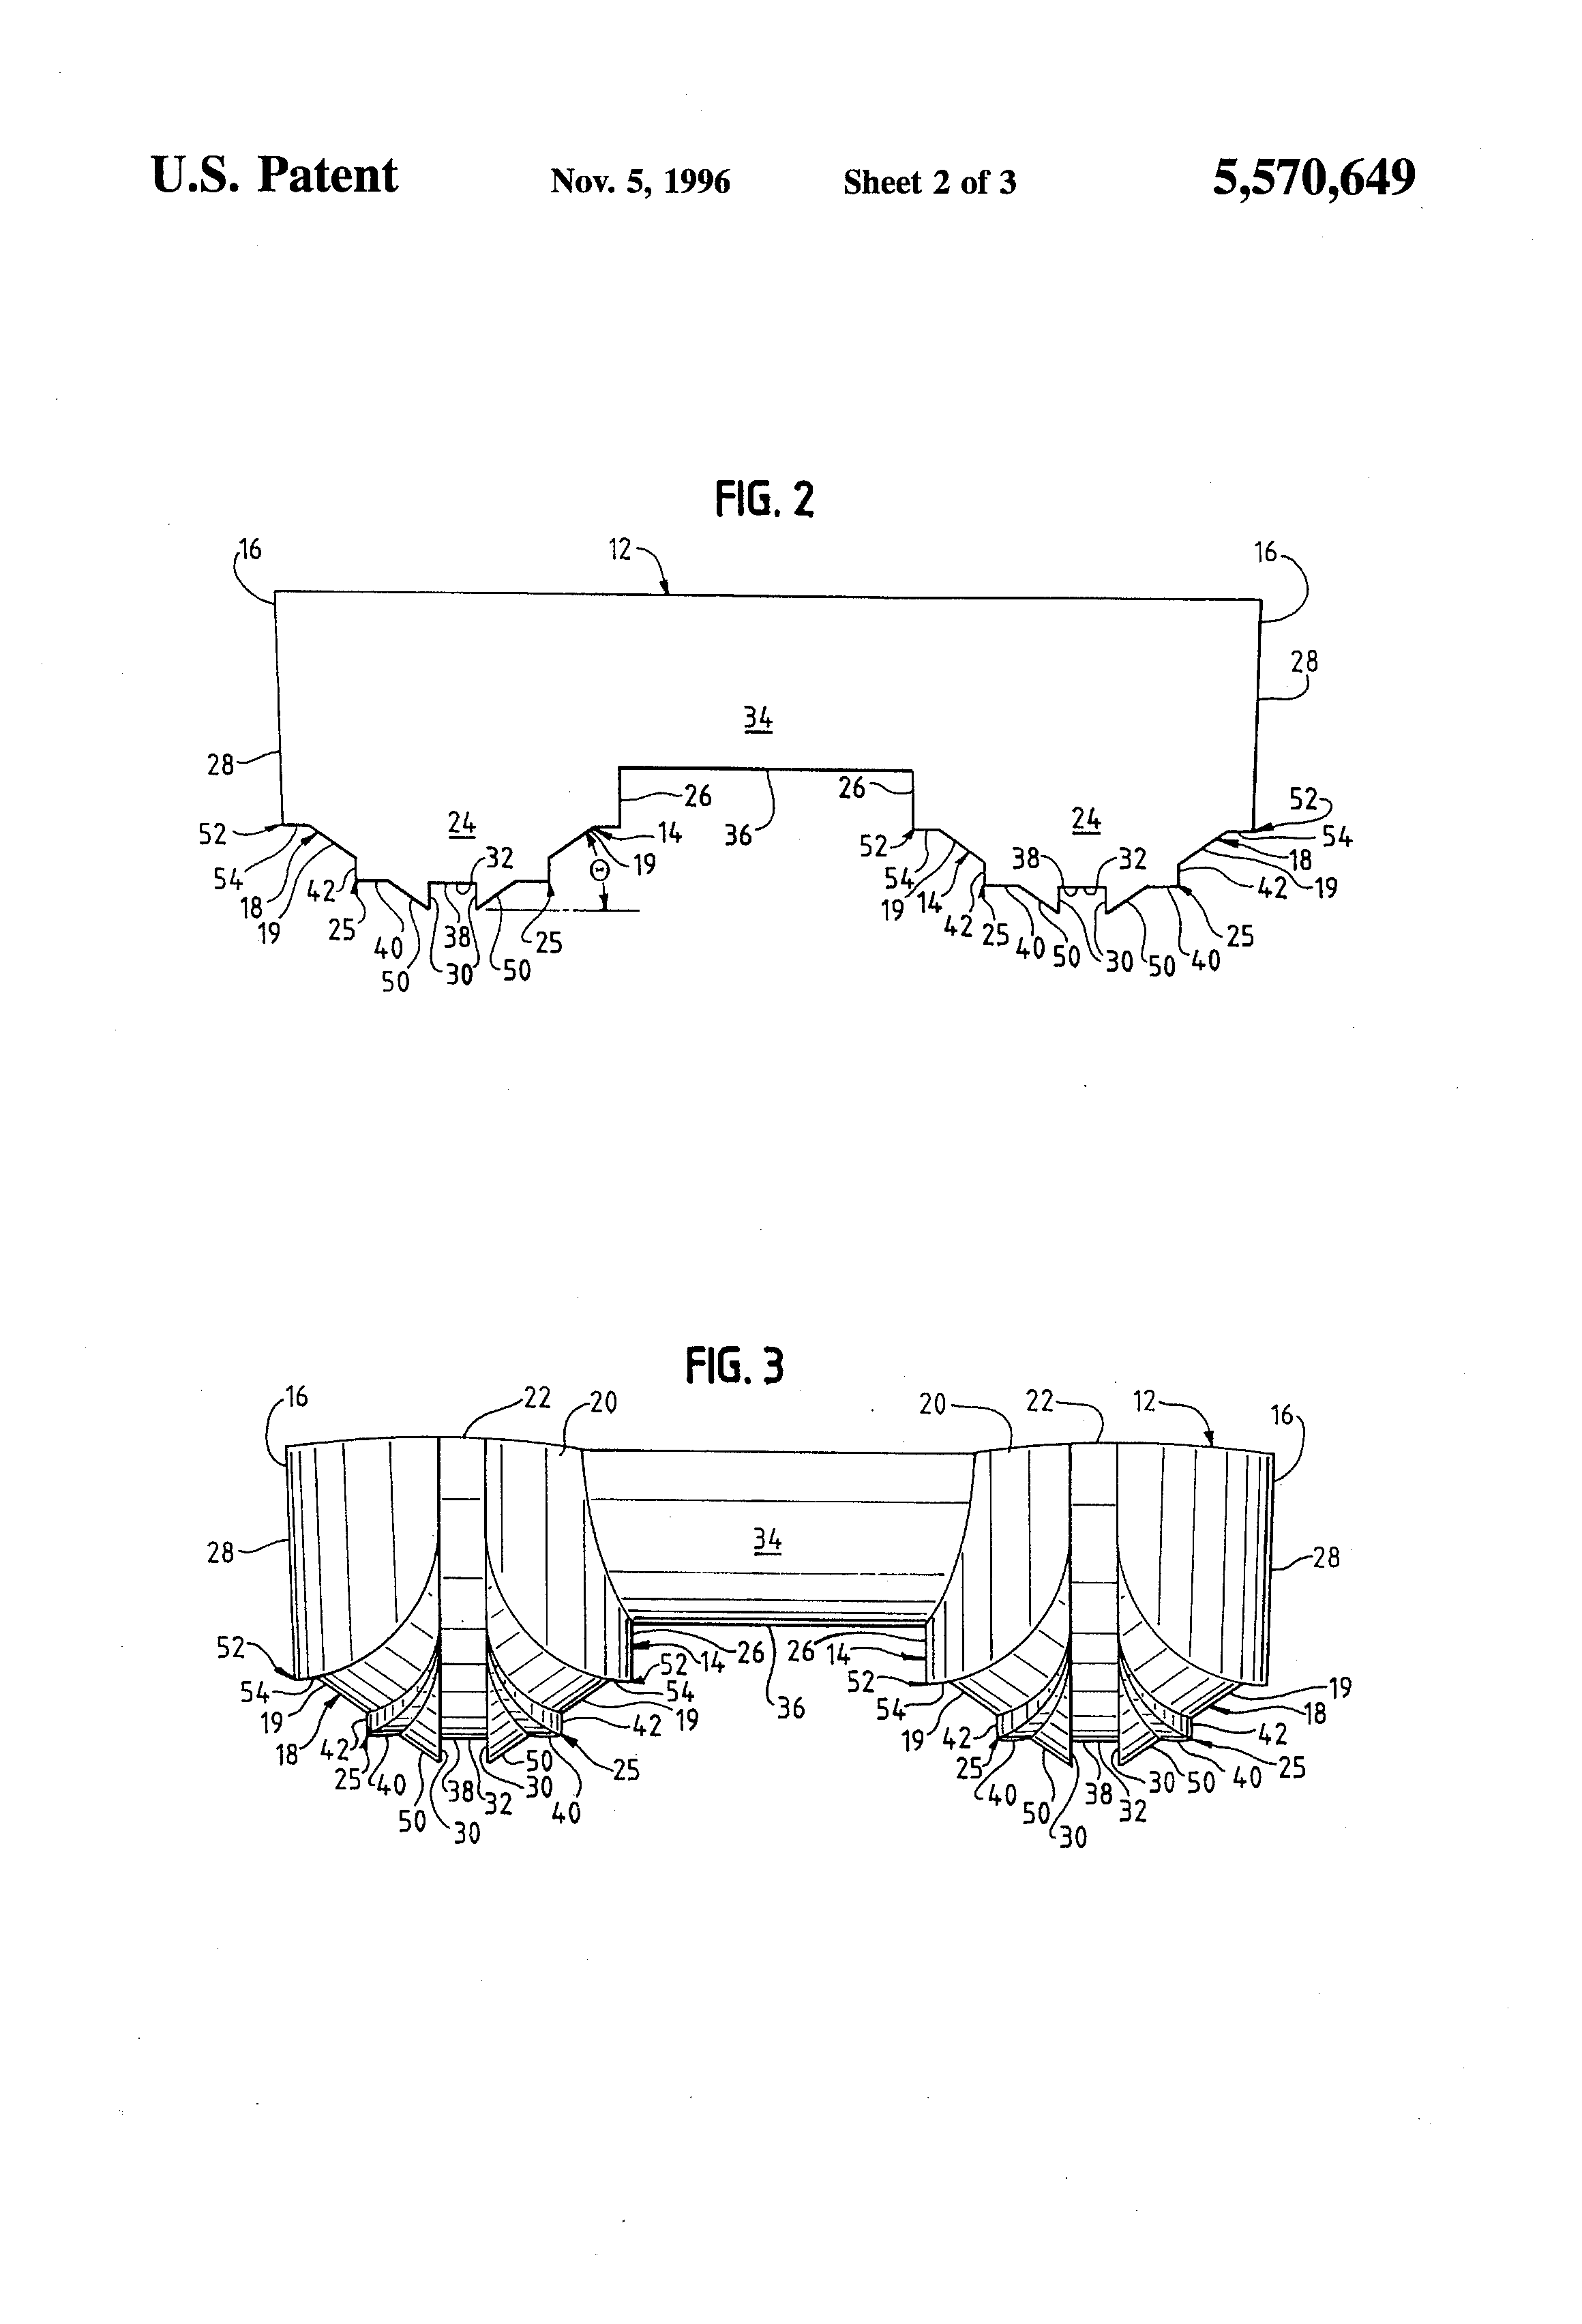 براءة الاختراع US5570649 - Boat hull - براءات اختراع Google